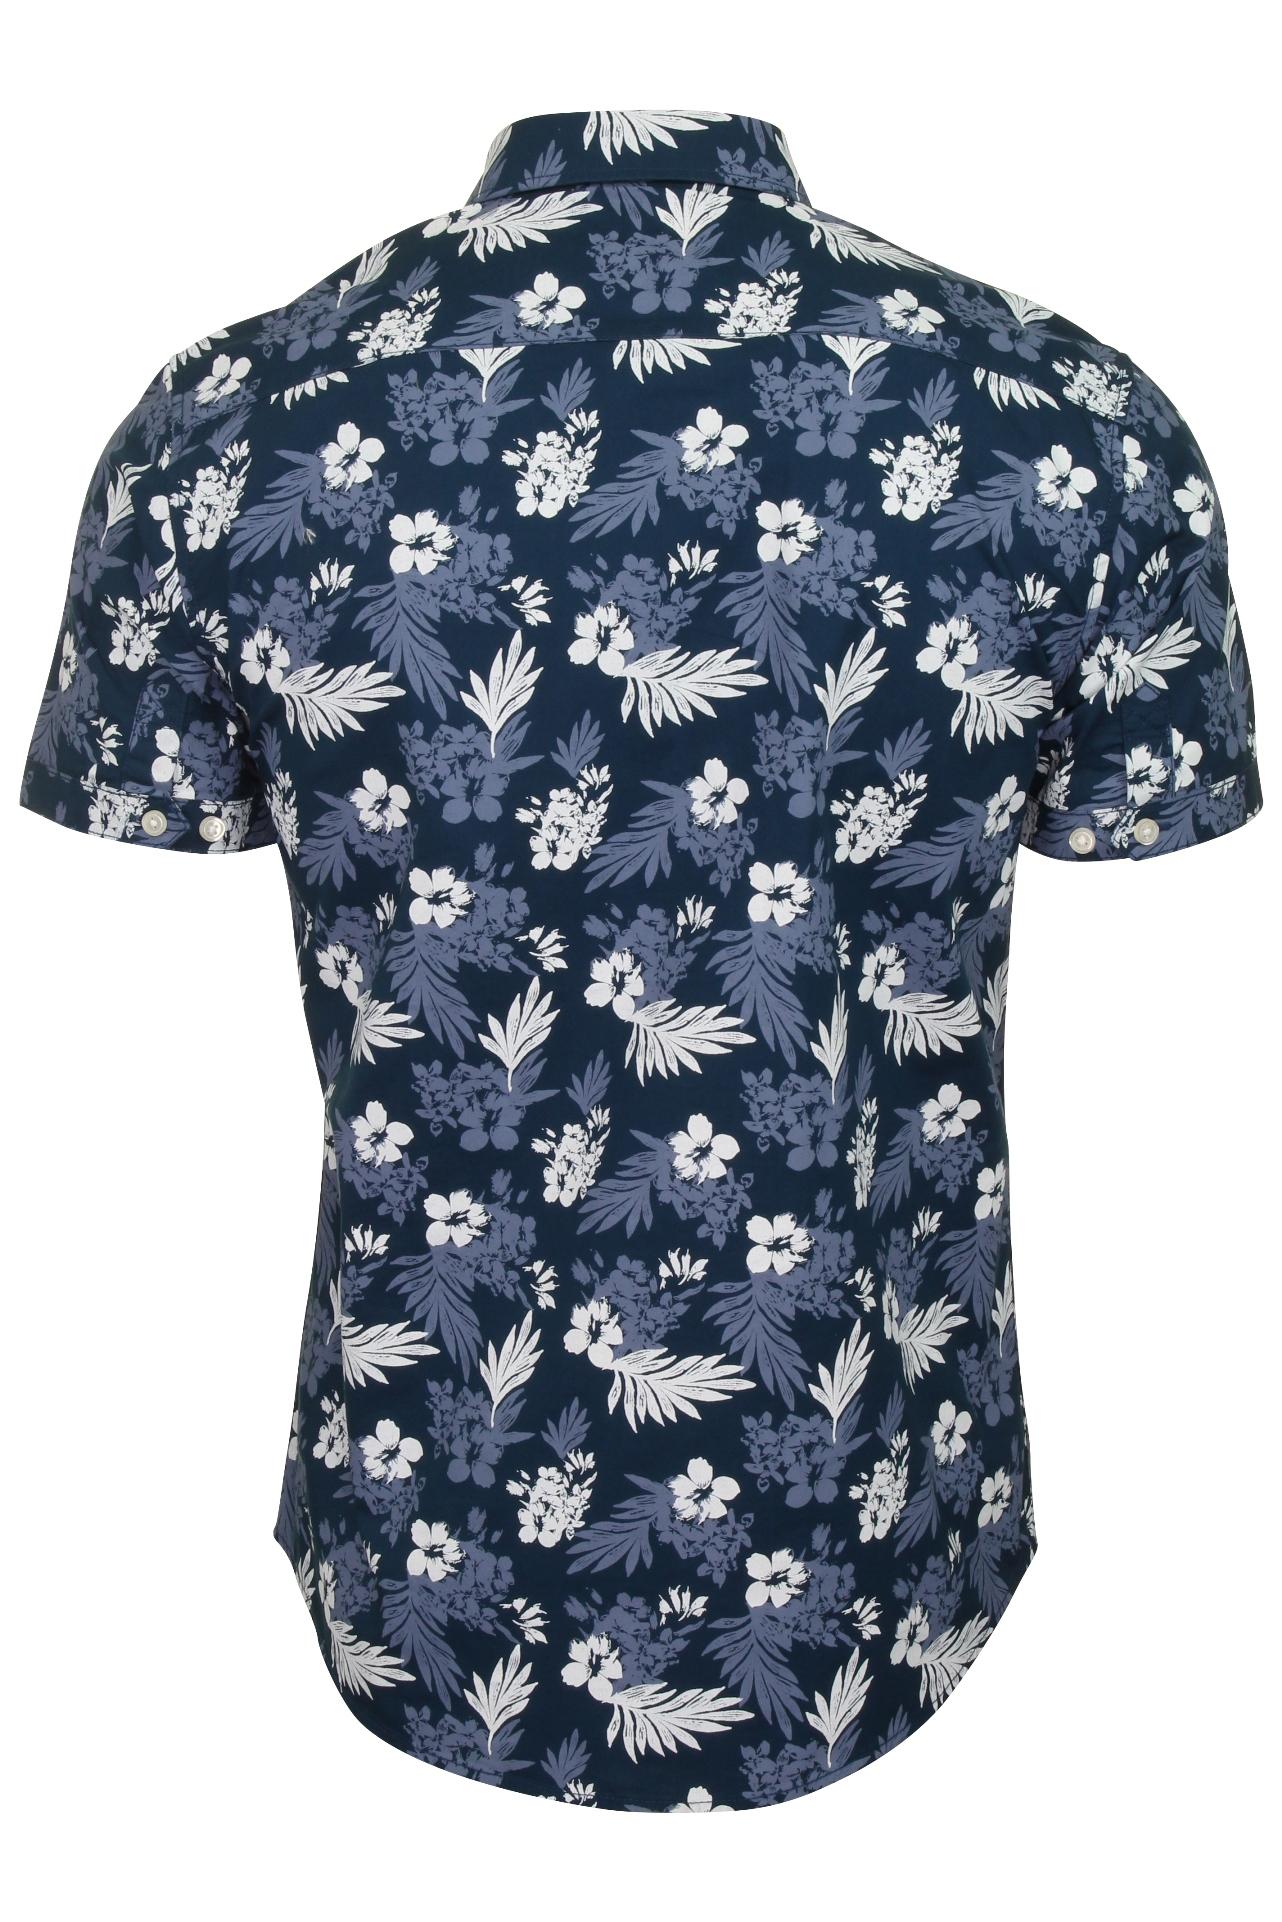 Tokyo-Laundry-Mens-039-Fermont-039-Hawaiian-Floral-Shirt-Short-Sleeved thumbnail 4